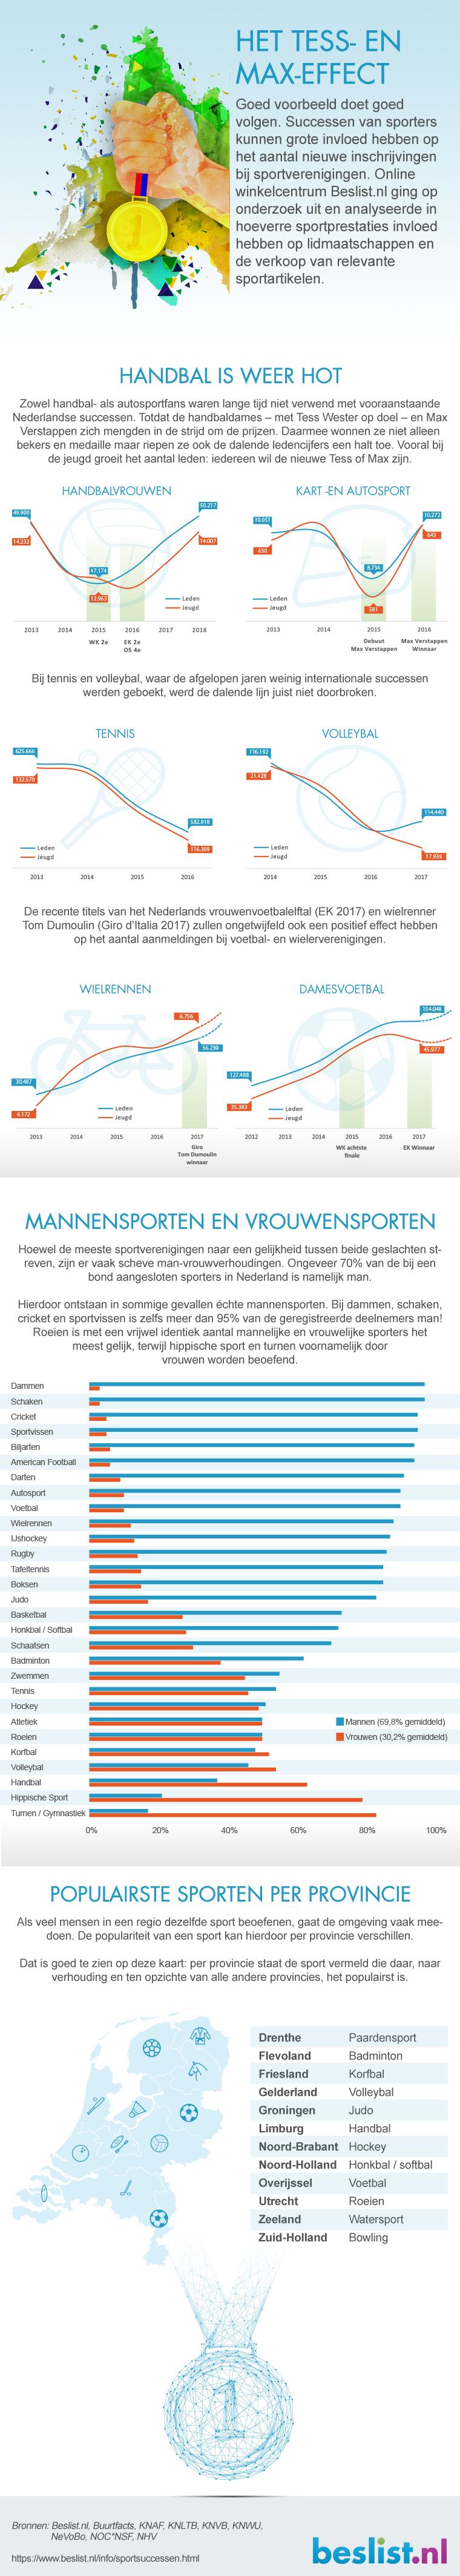 Infographic sportsuccessen